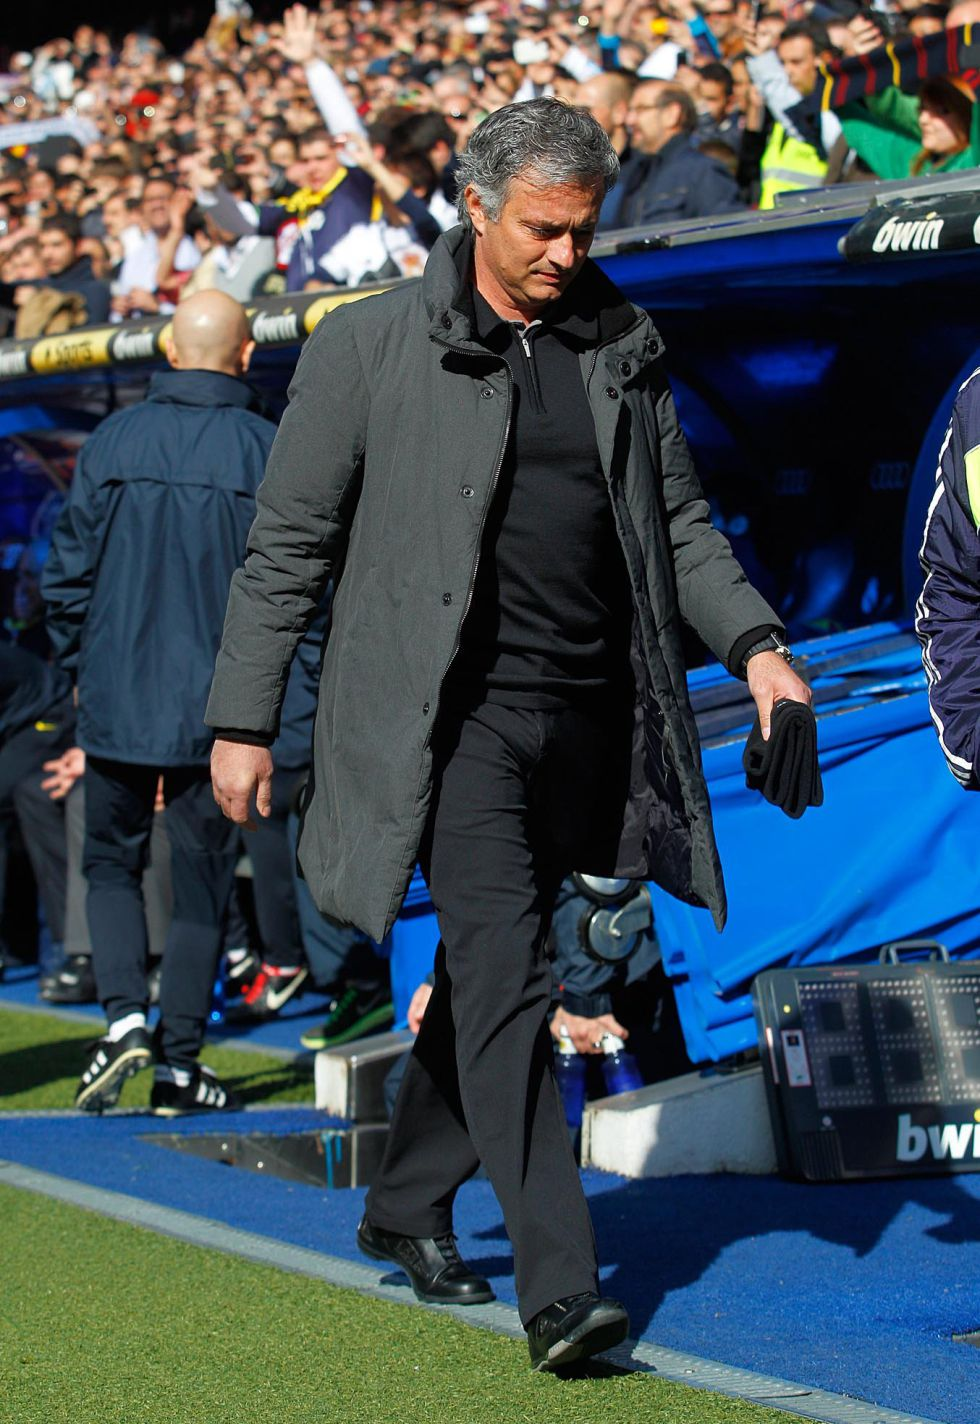 Mourinho no seguirá la próxima temporada, según la SER